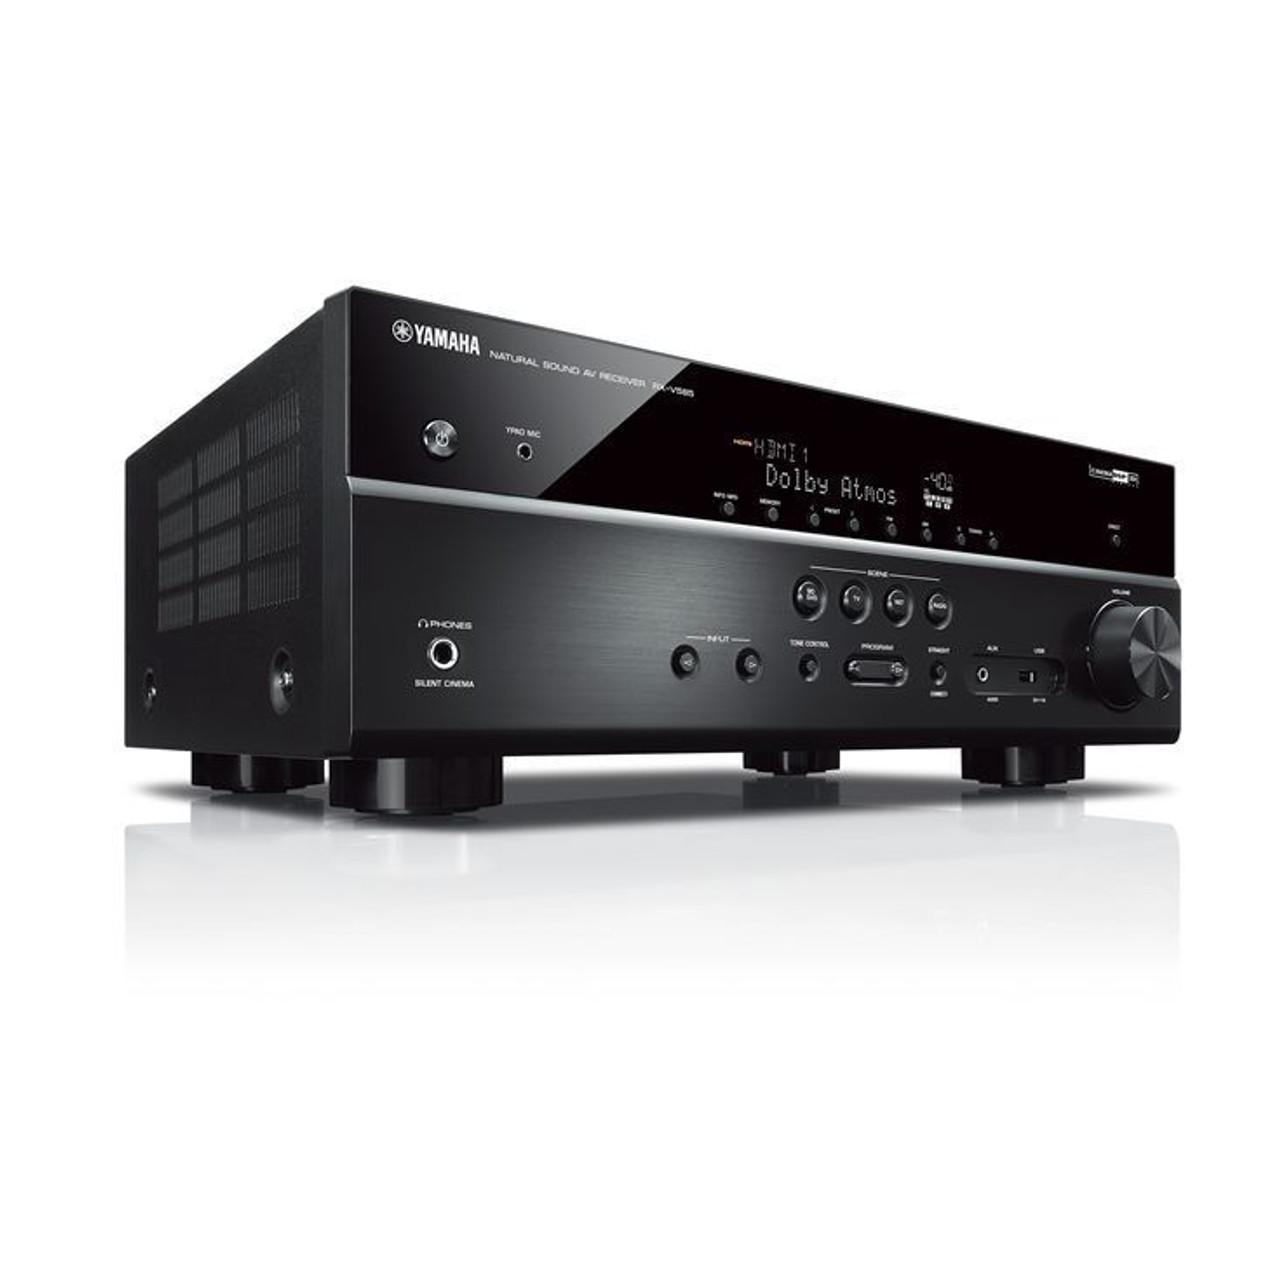 Yamaha RX-V585 7.2 Ch AV Receiver with MusicCast - NEW MODEL